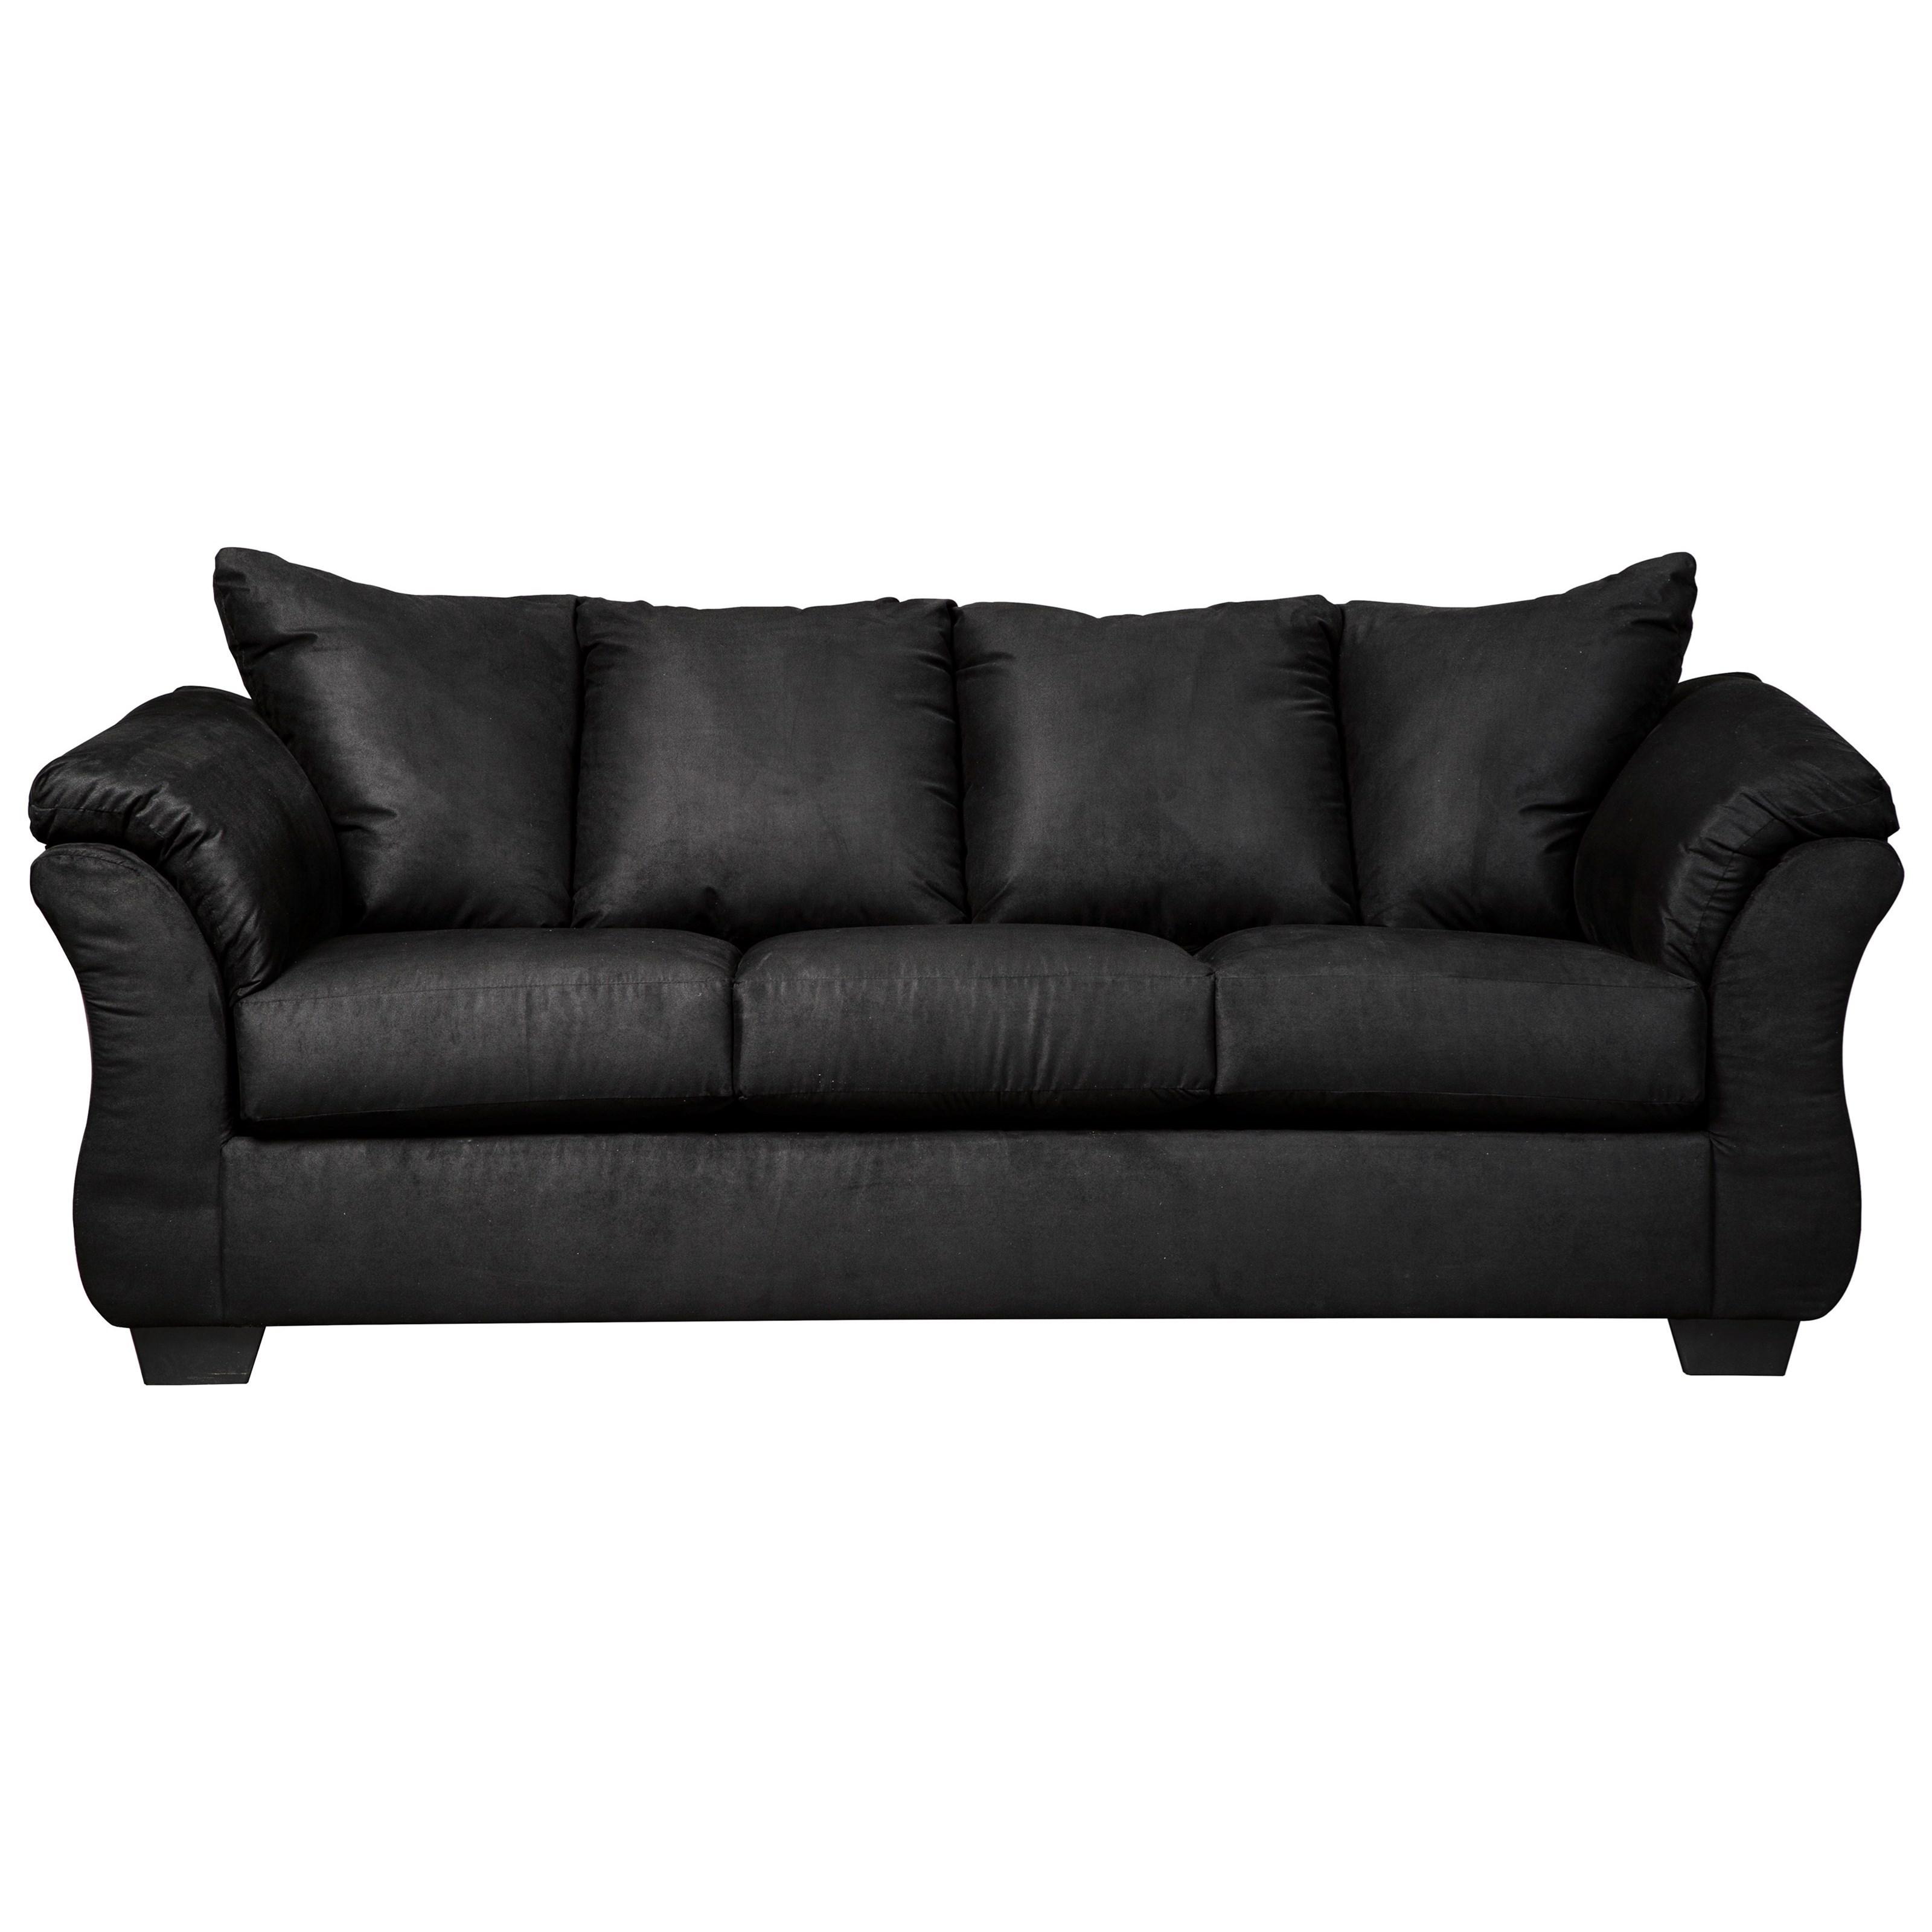 Darcy - Black Stationary Sofa by Ashley (Signature Design) at Johnny Janosik